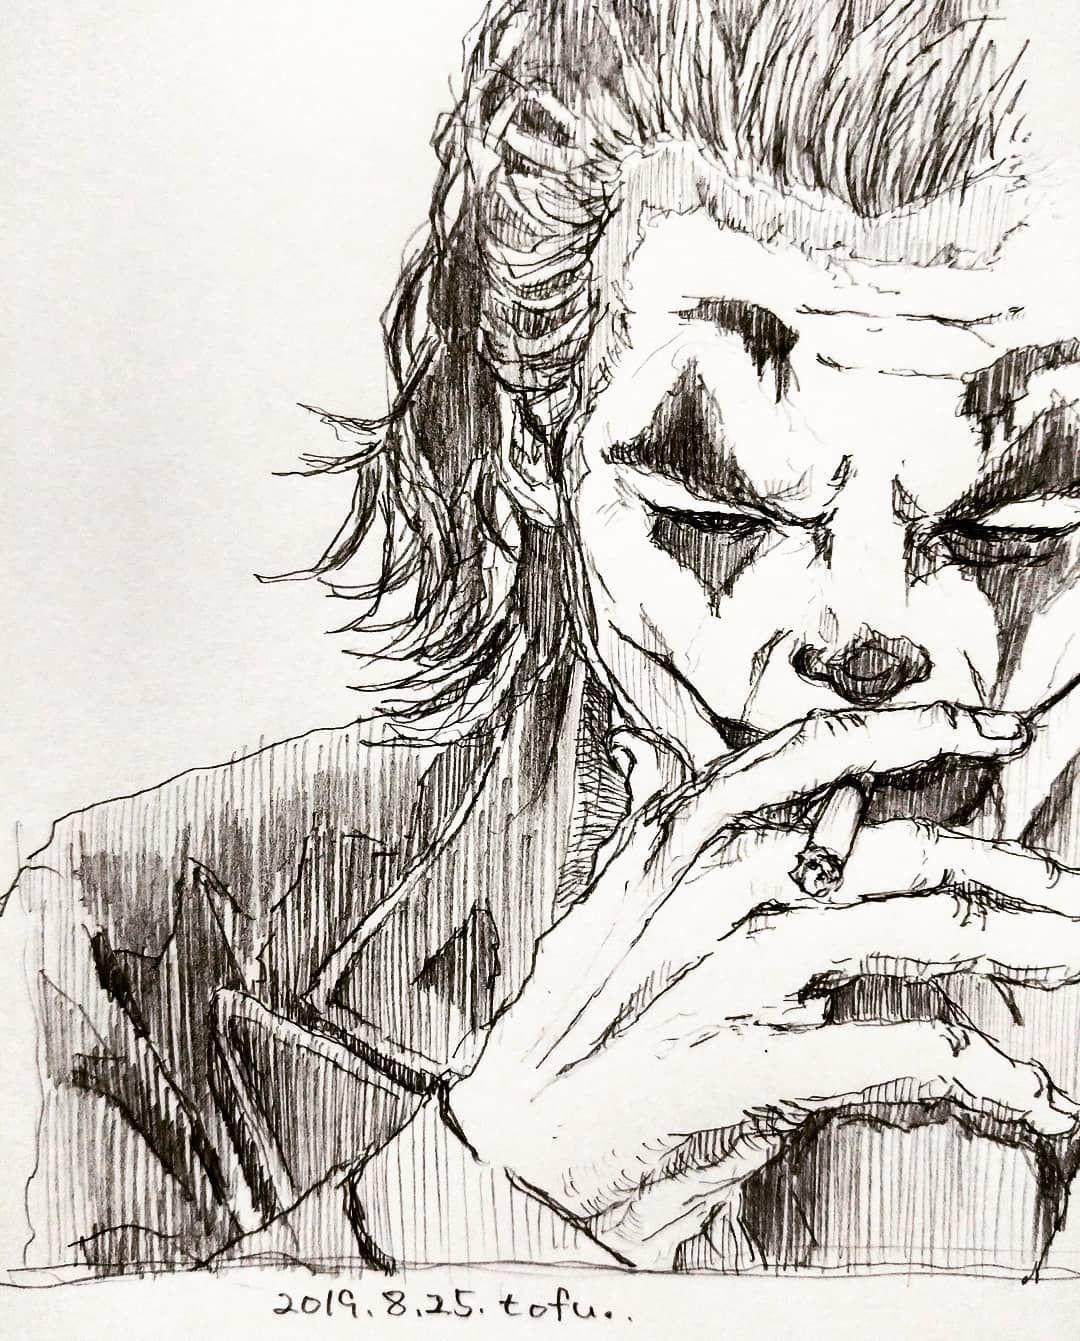 Paint Painting Artsy Artoftheday Artlife Art Paintings Farbe Painter Joker Drawing Sketch Dessin Waterco Joker Art Drawing Joker Drawings Joker Art